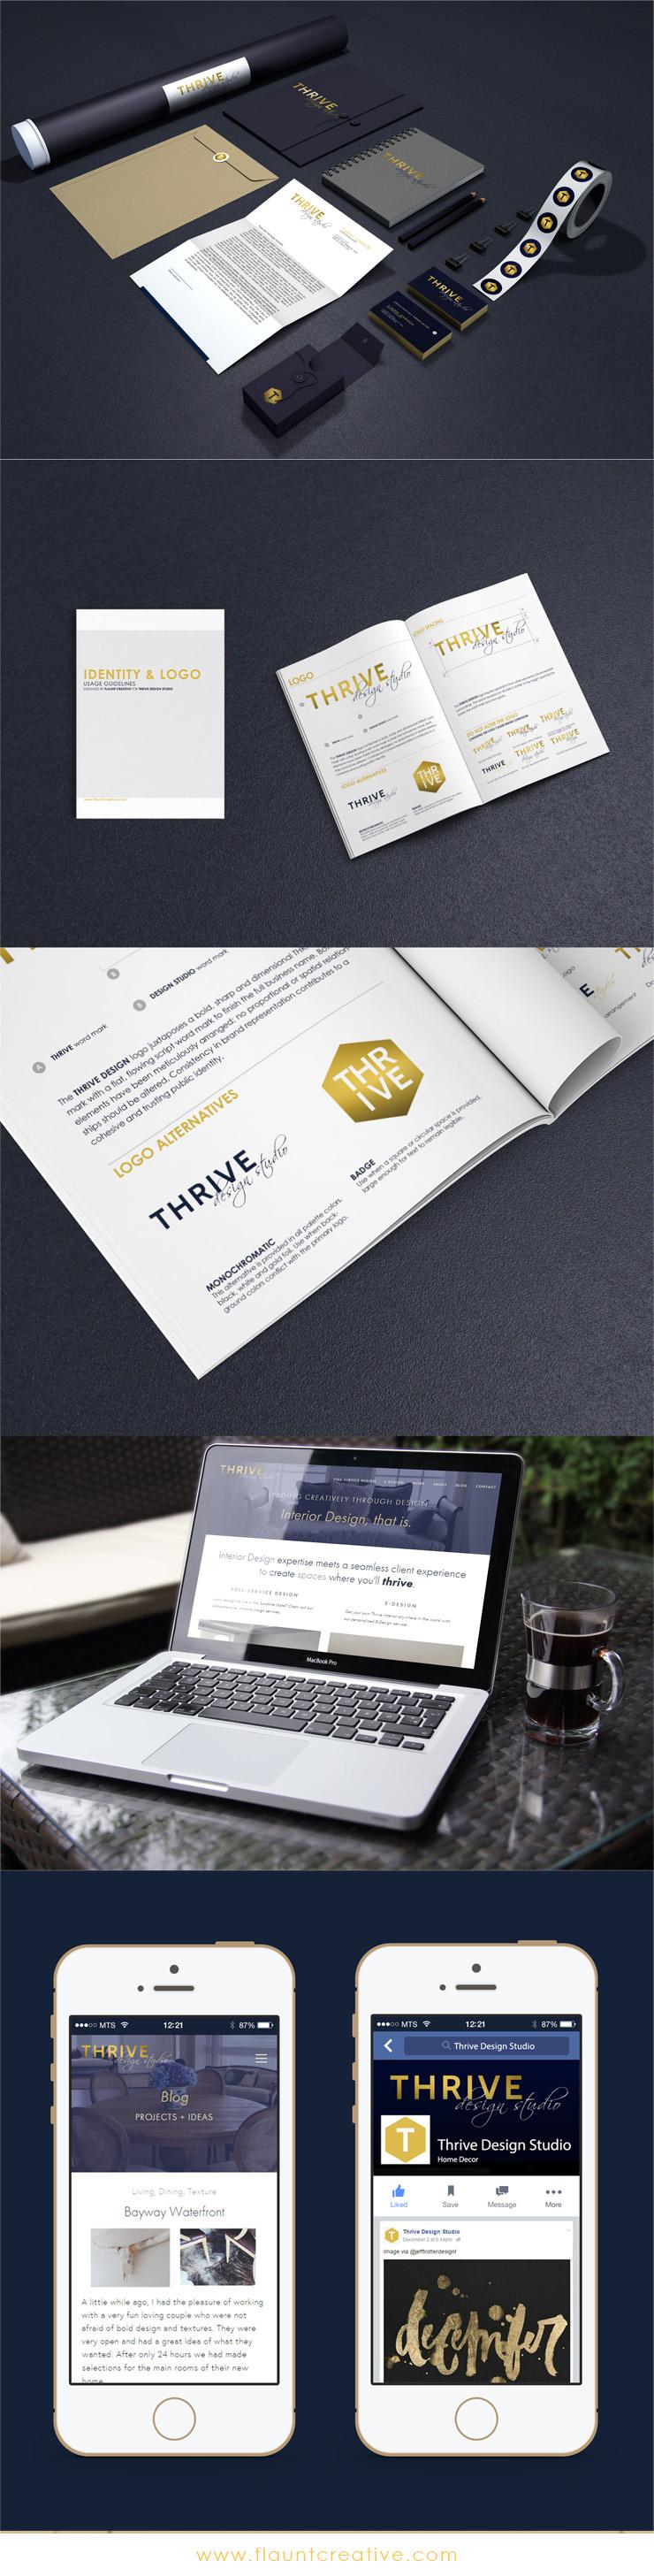 Graphic Design + Market Strategy